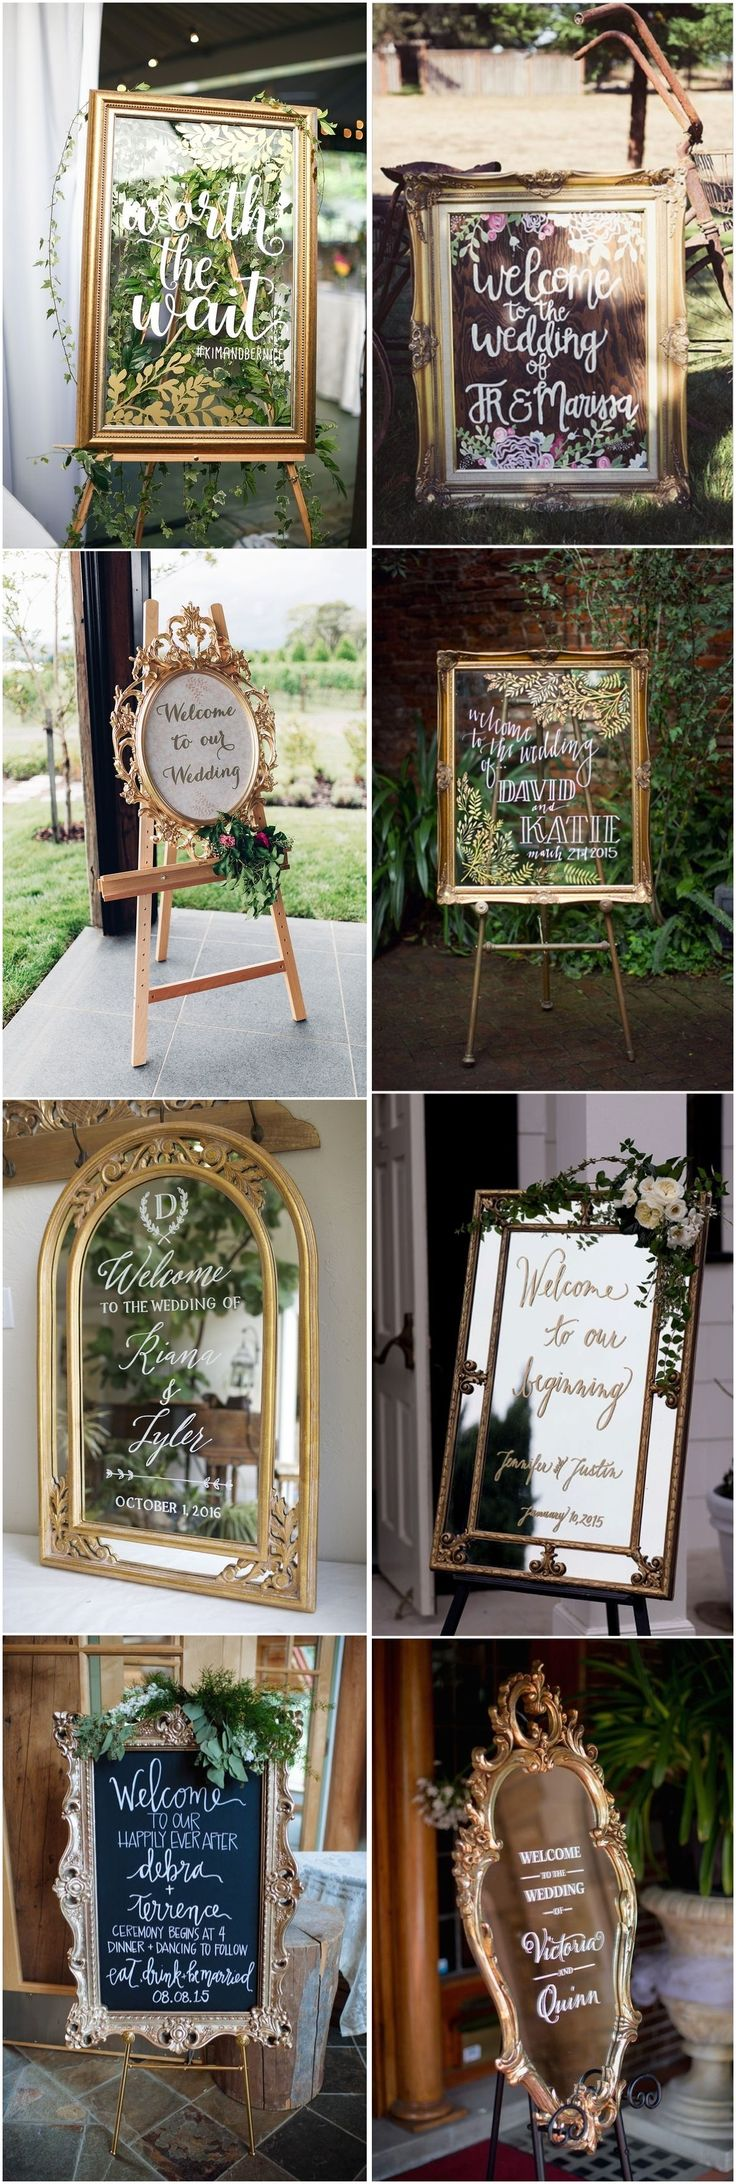 vintage wedding welcome sign #weddingsigns #gold #vintage #weddingdecor #vintageweddings ❤️ http://www.deerpearlflowers.com/vintage-welcome-wedding-sign-ideas/